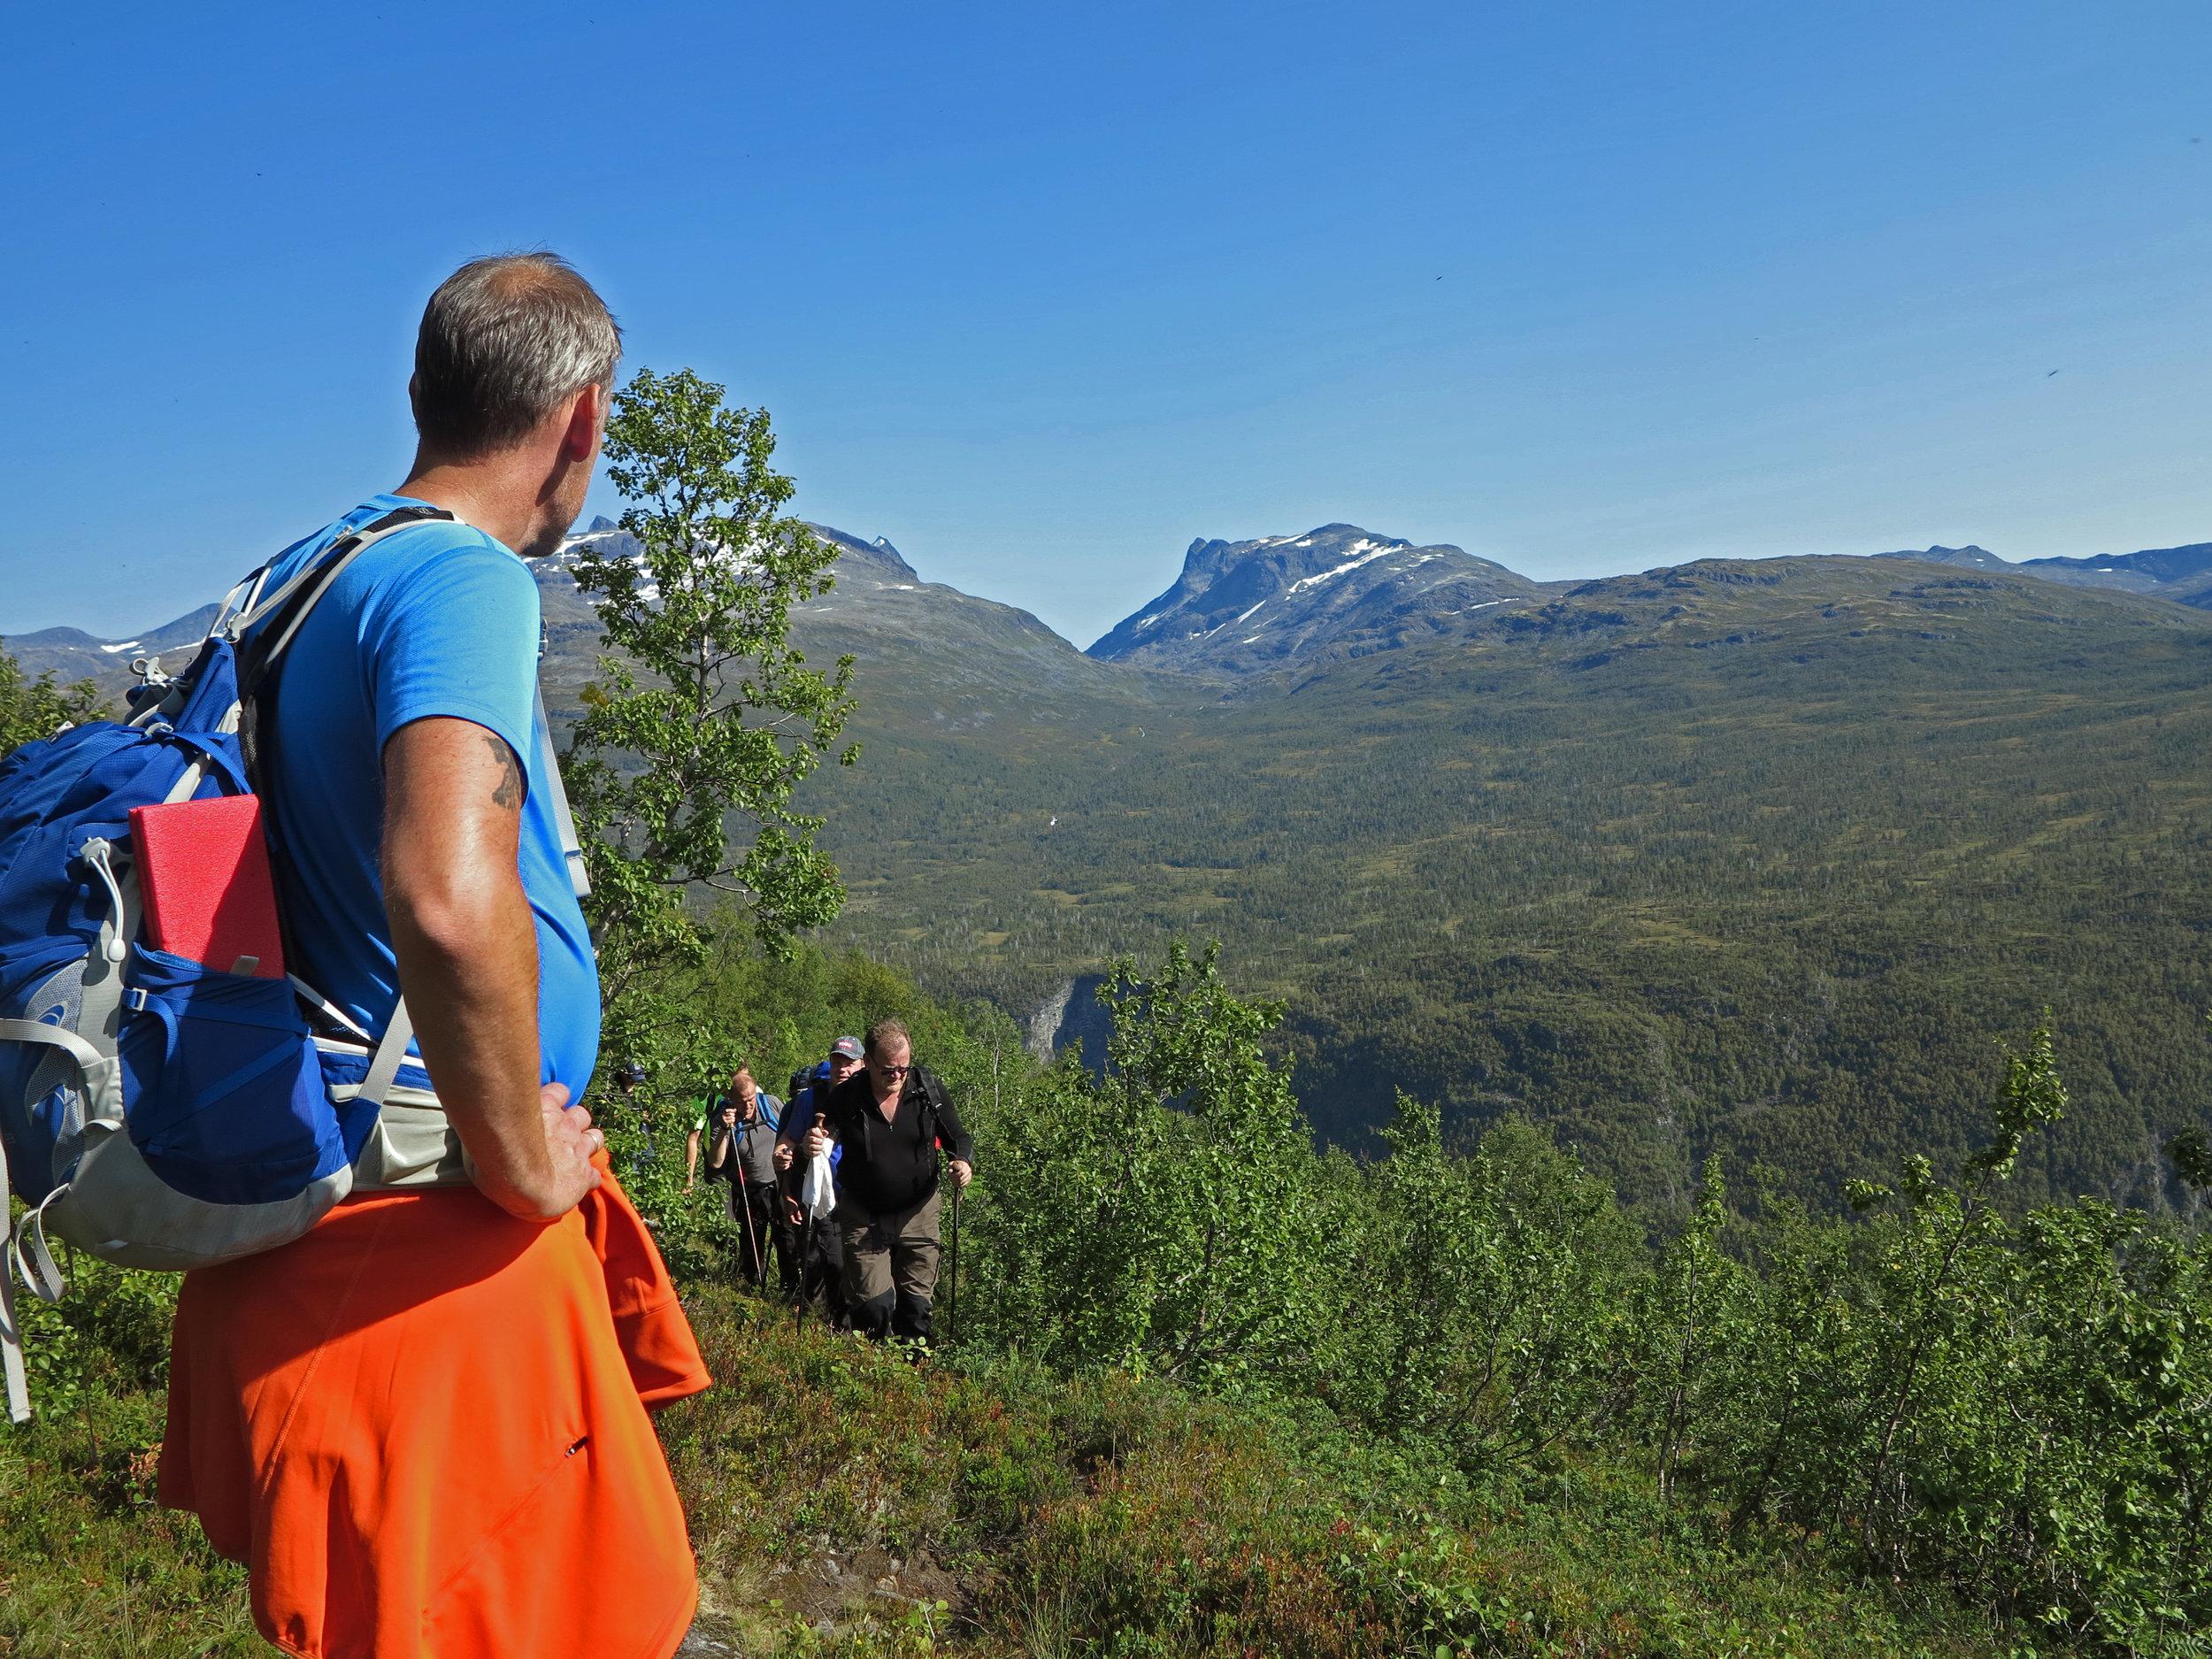 The hike from Stølsmaradalen to Avdalen Gard offer many viewpoints towards the mountainpeaks of Jotunheimen, the valley of Utladalen and the Vettisfossen waterfall. Photo: www.bulderogbrak.no